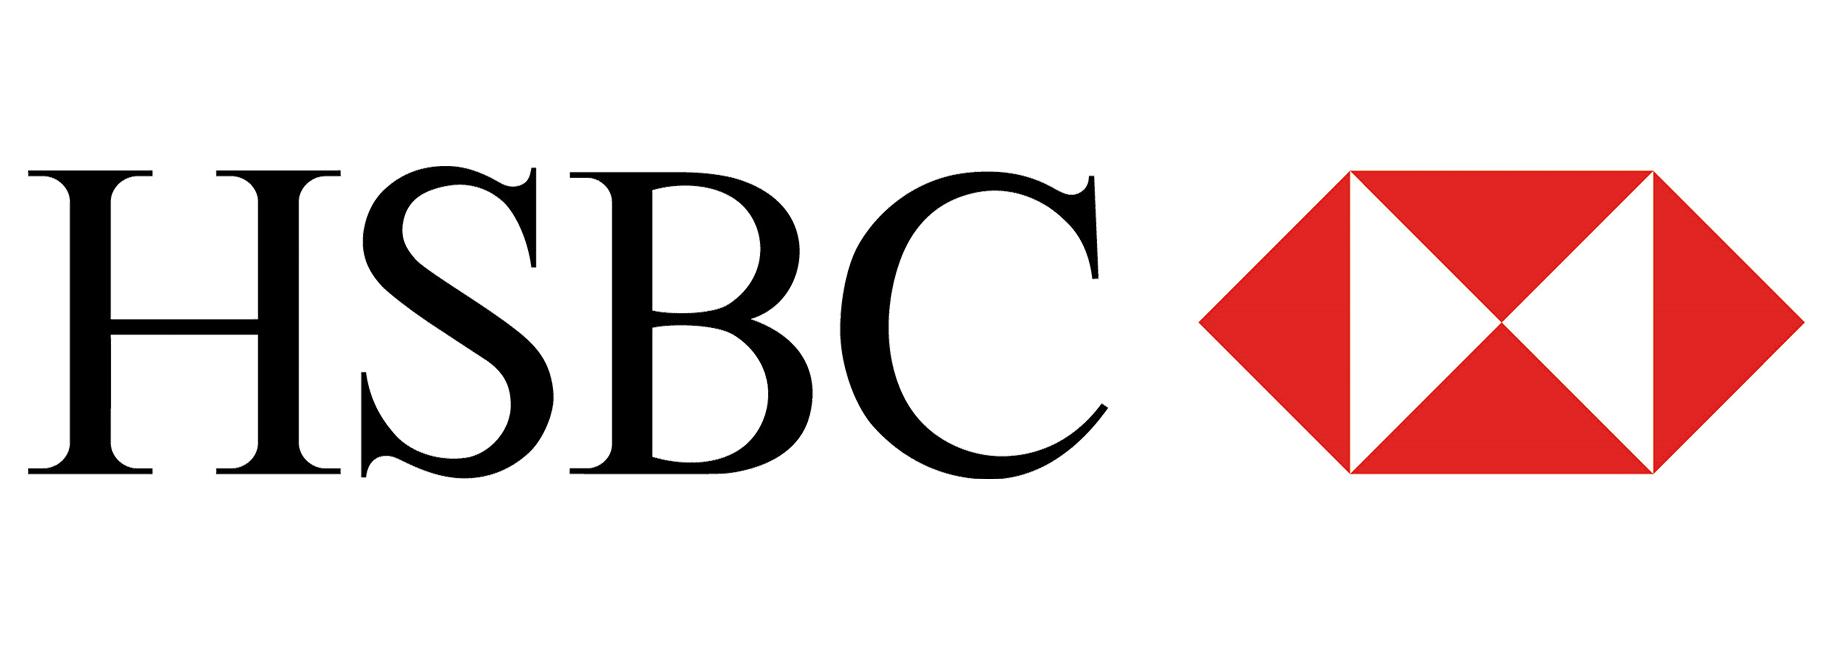 HSBC - Potential - Empower Clients